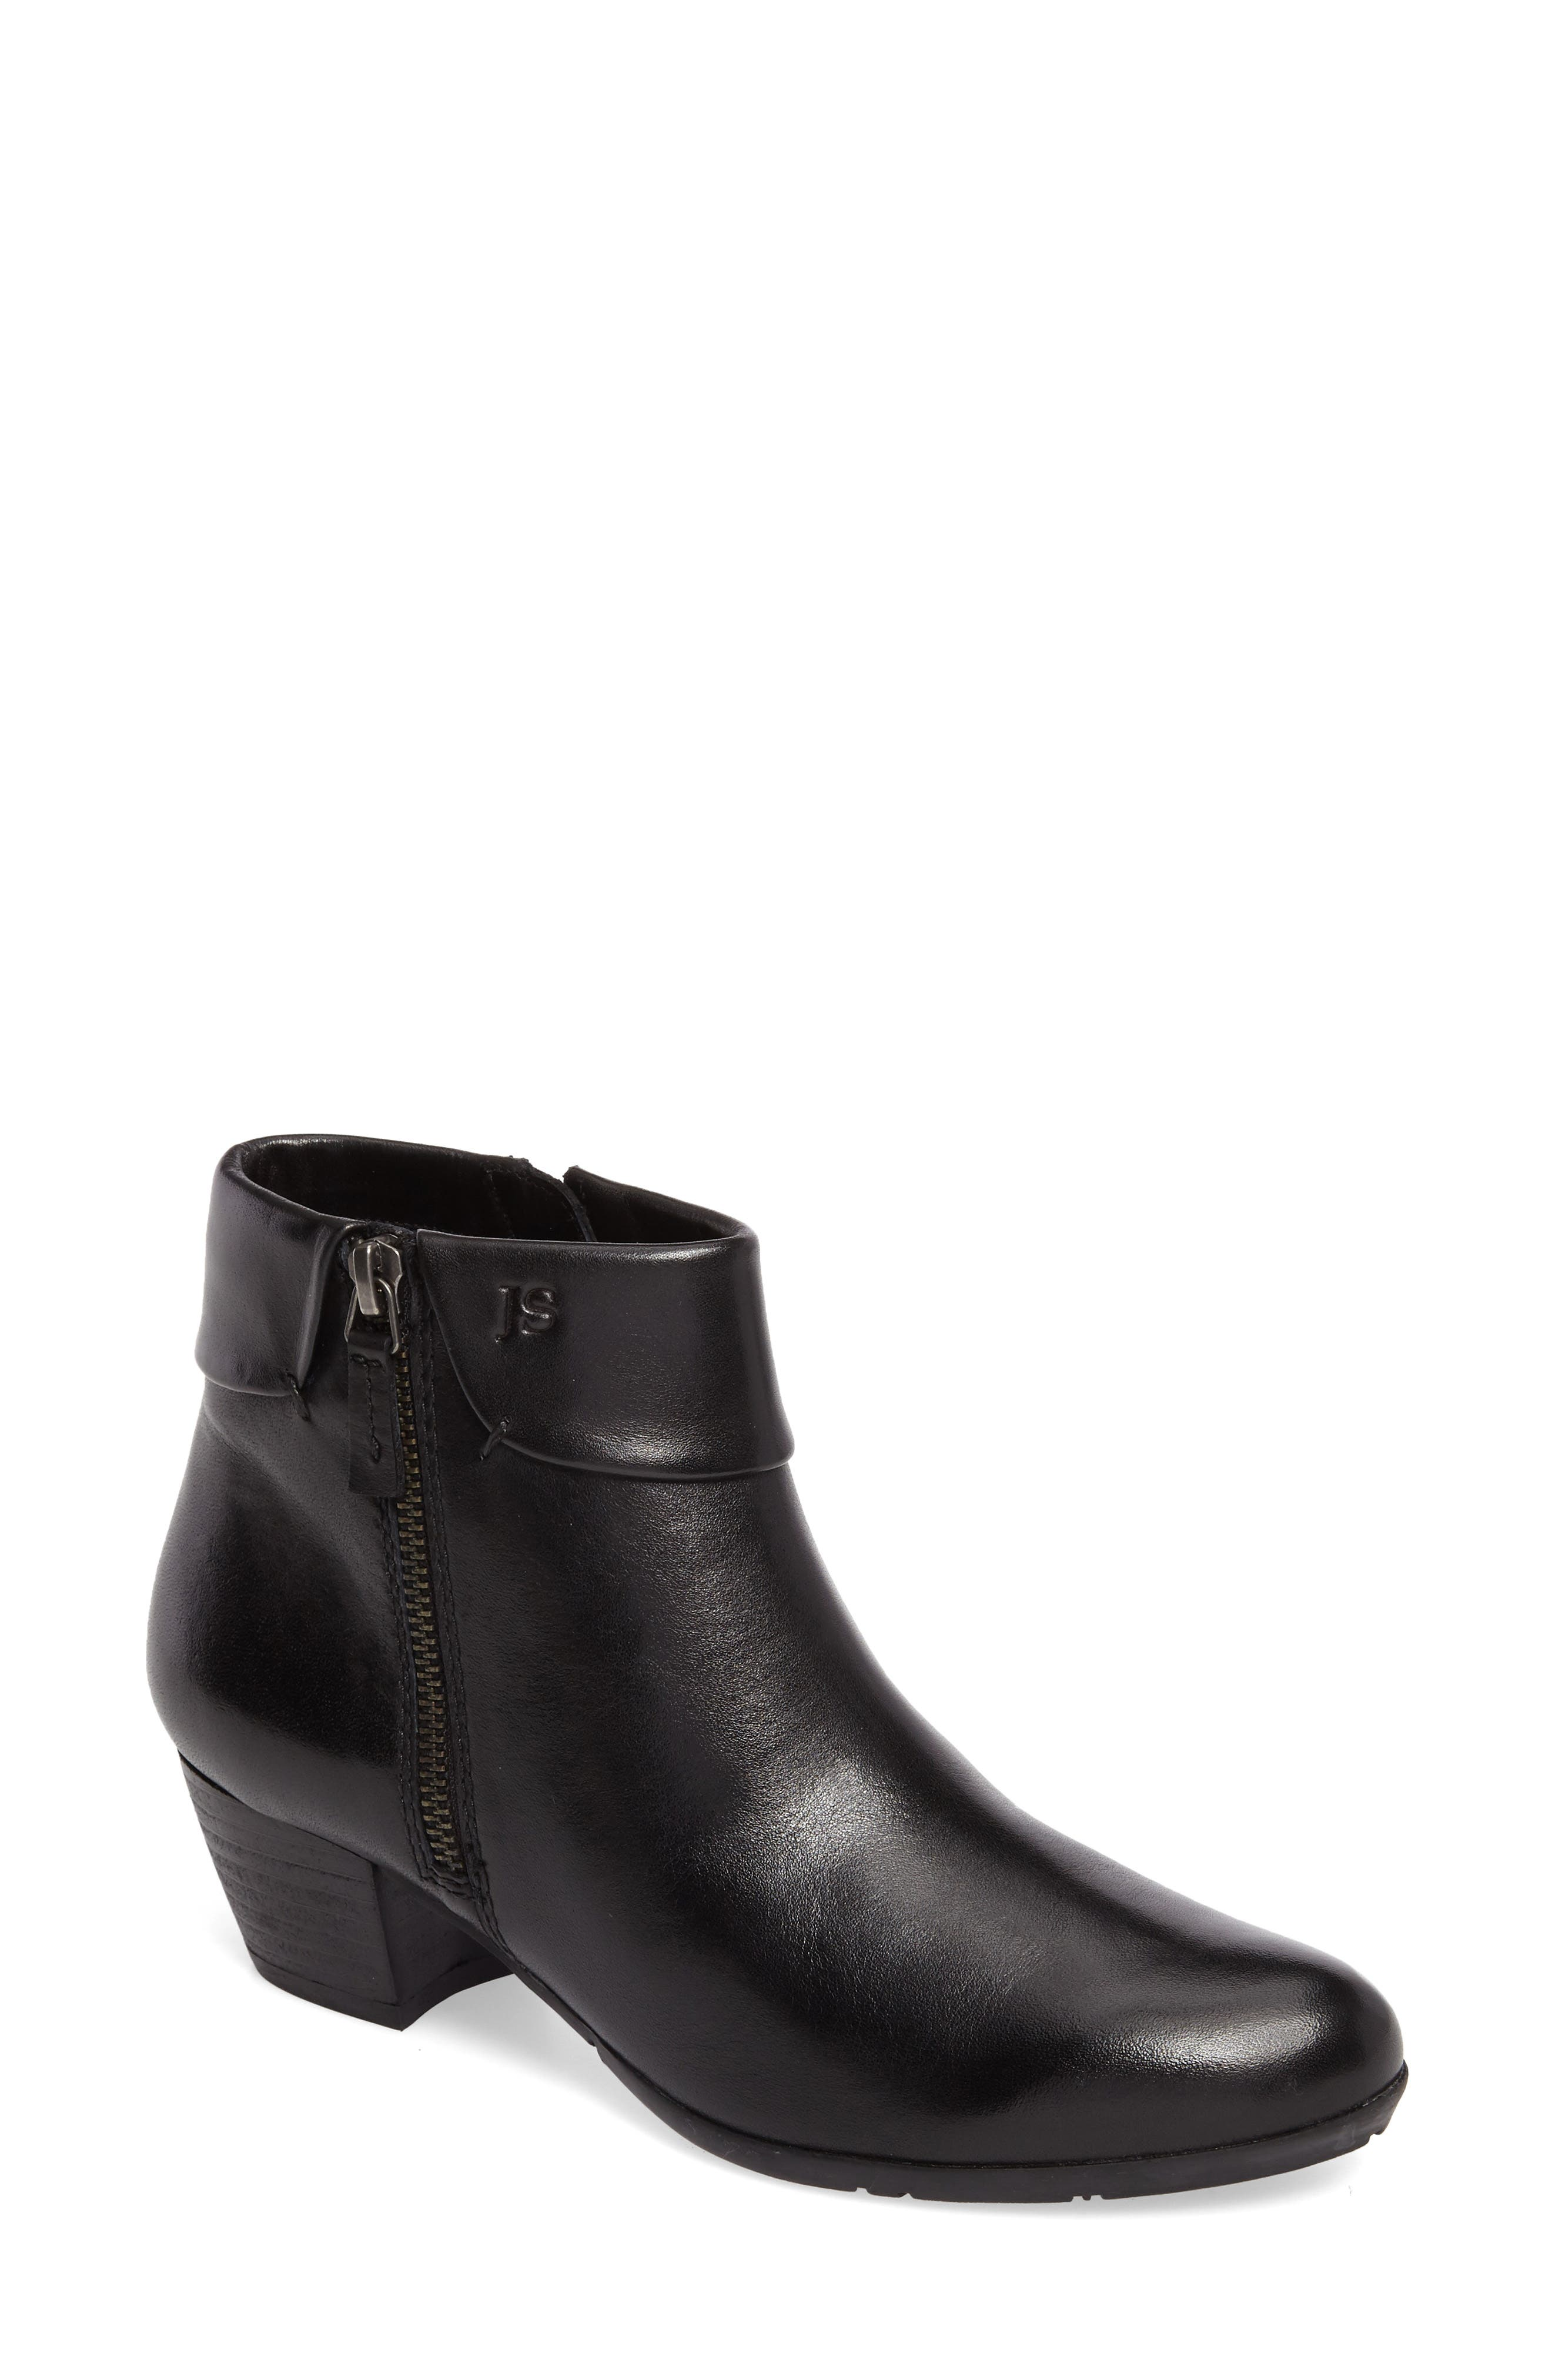 Sue 05 Bootie,                         Main,                         color, Black Leather